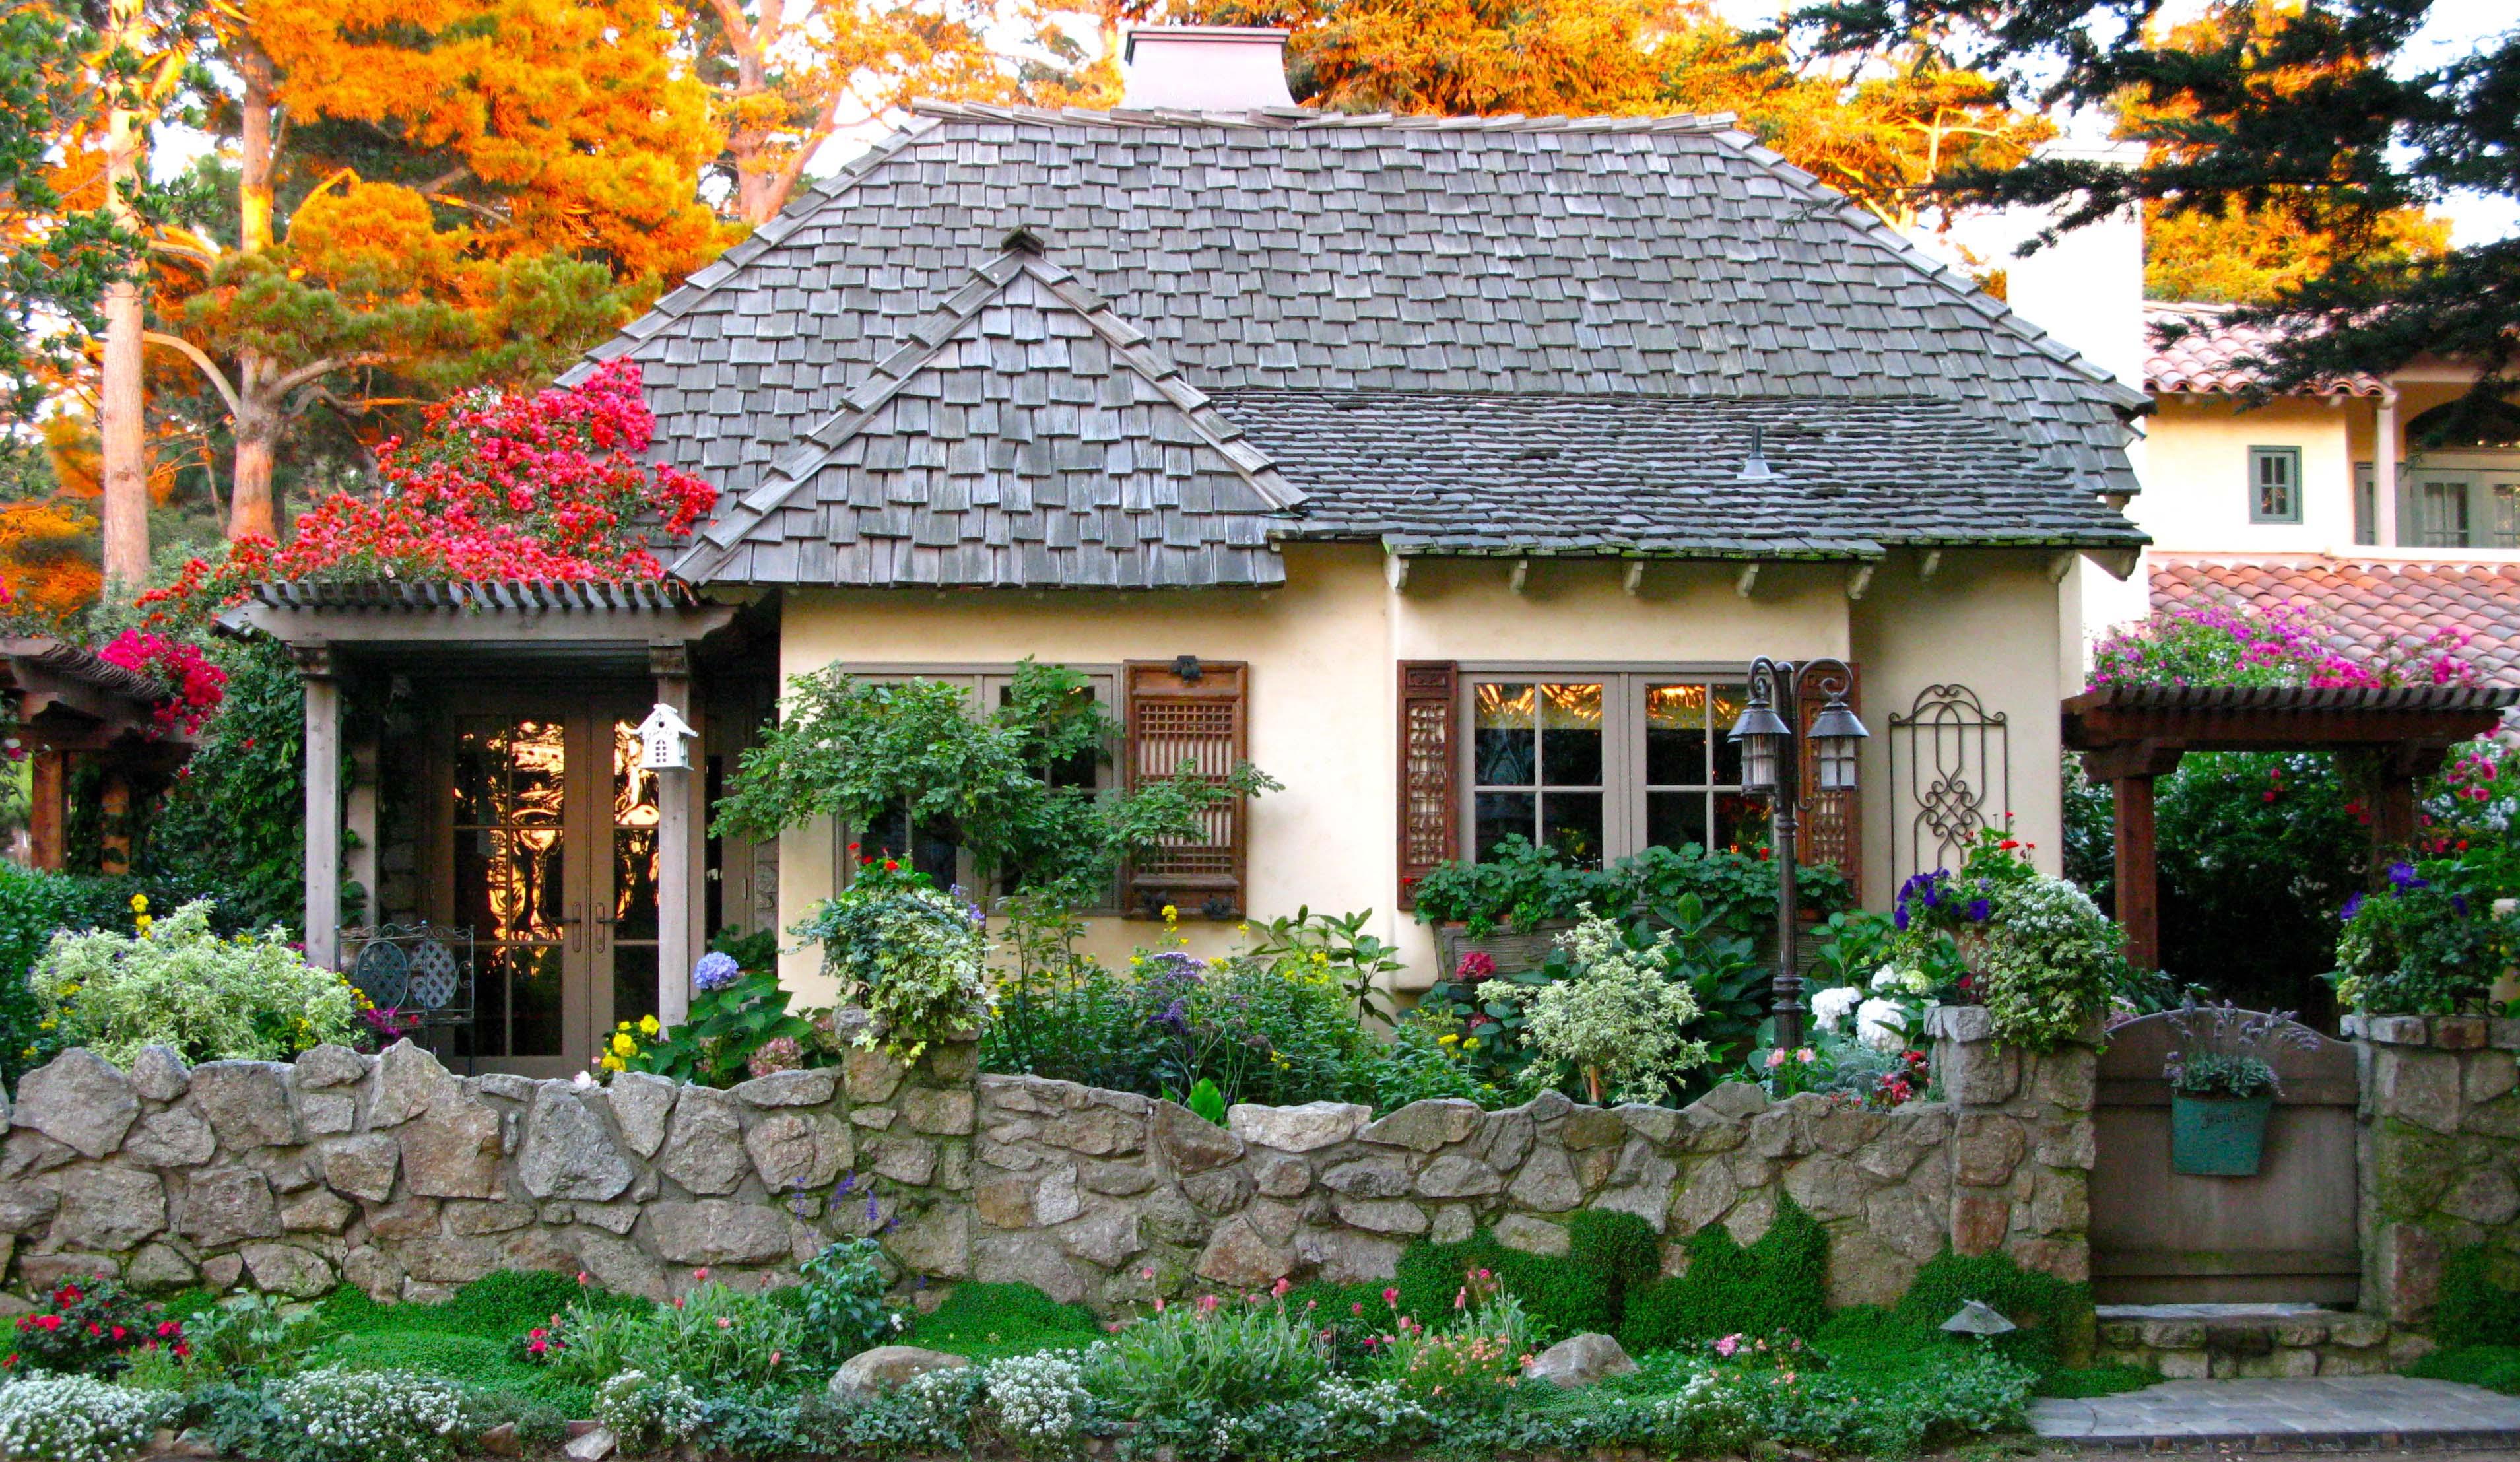 Cottage musings for February. www.chatfieldcourt.com